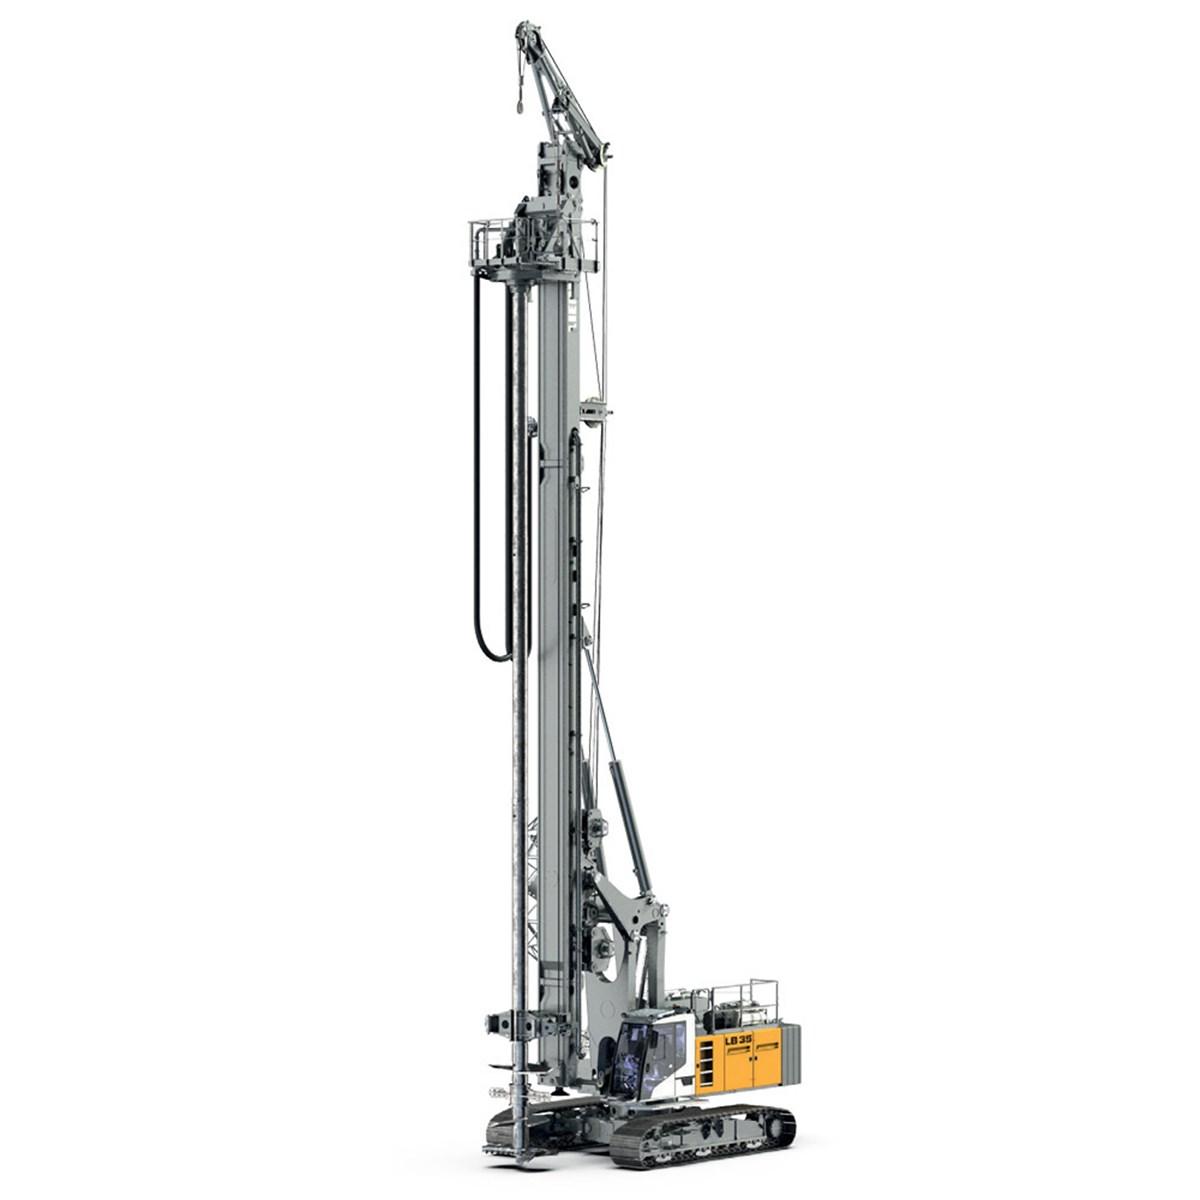 liebherr-lb-35-drilling-rig-bohrgerat-bodenmischen-soilmixing-1.jpg